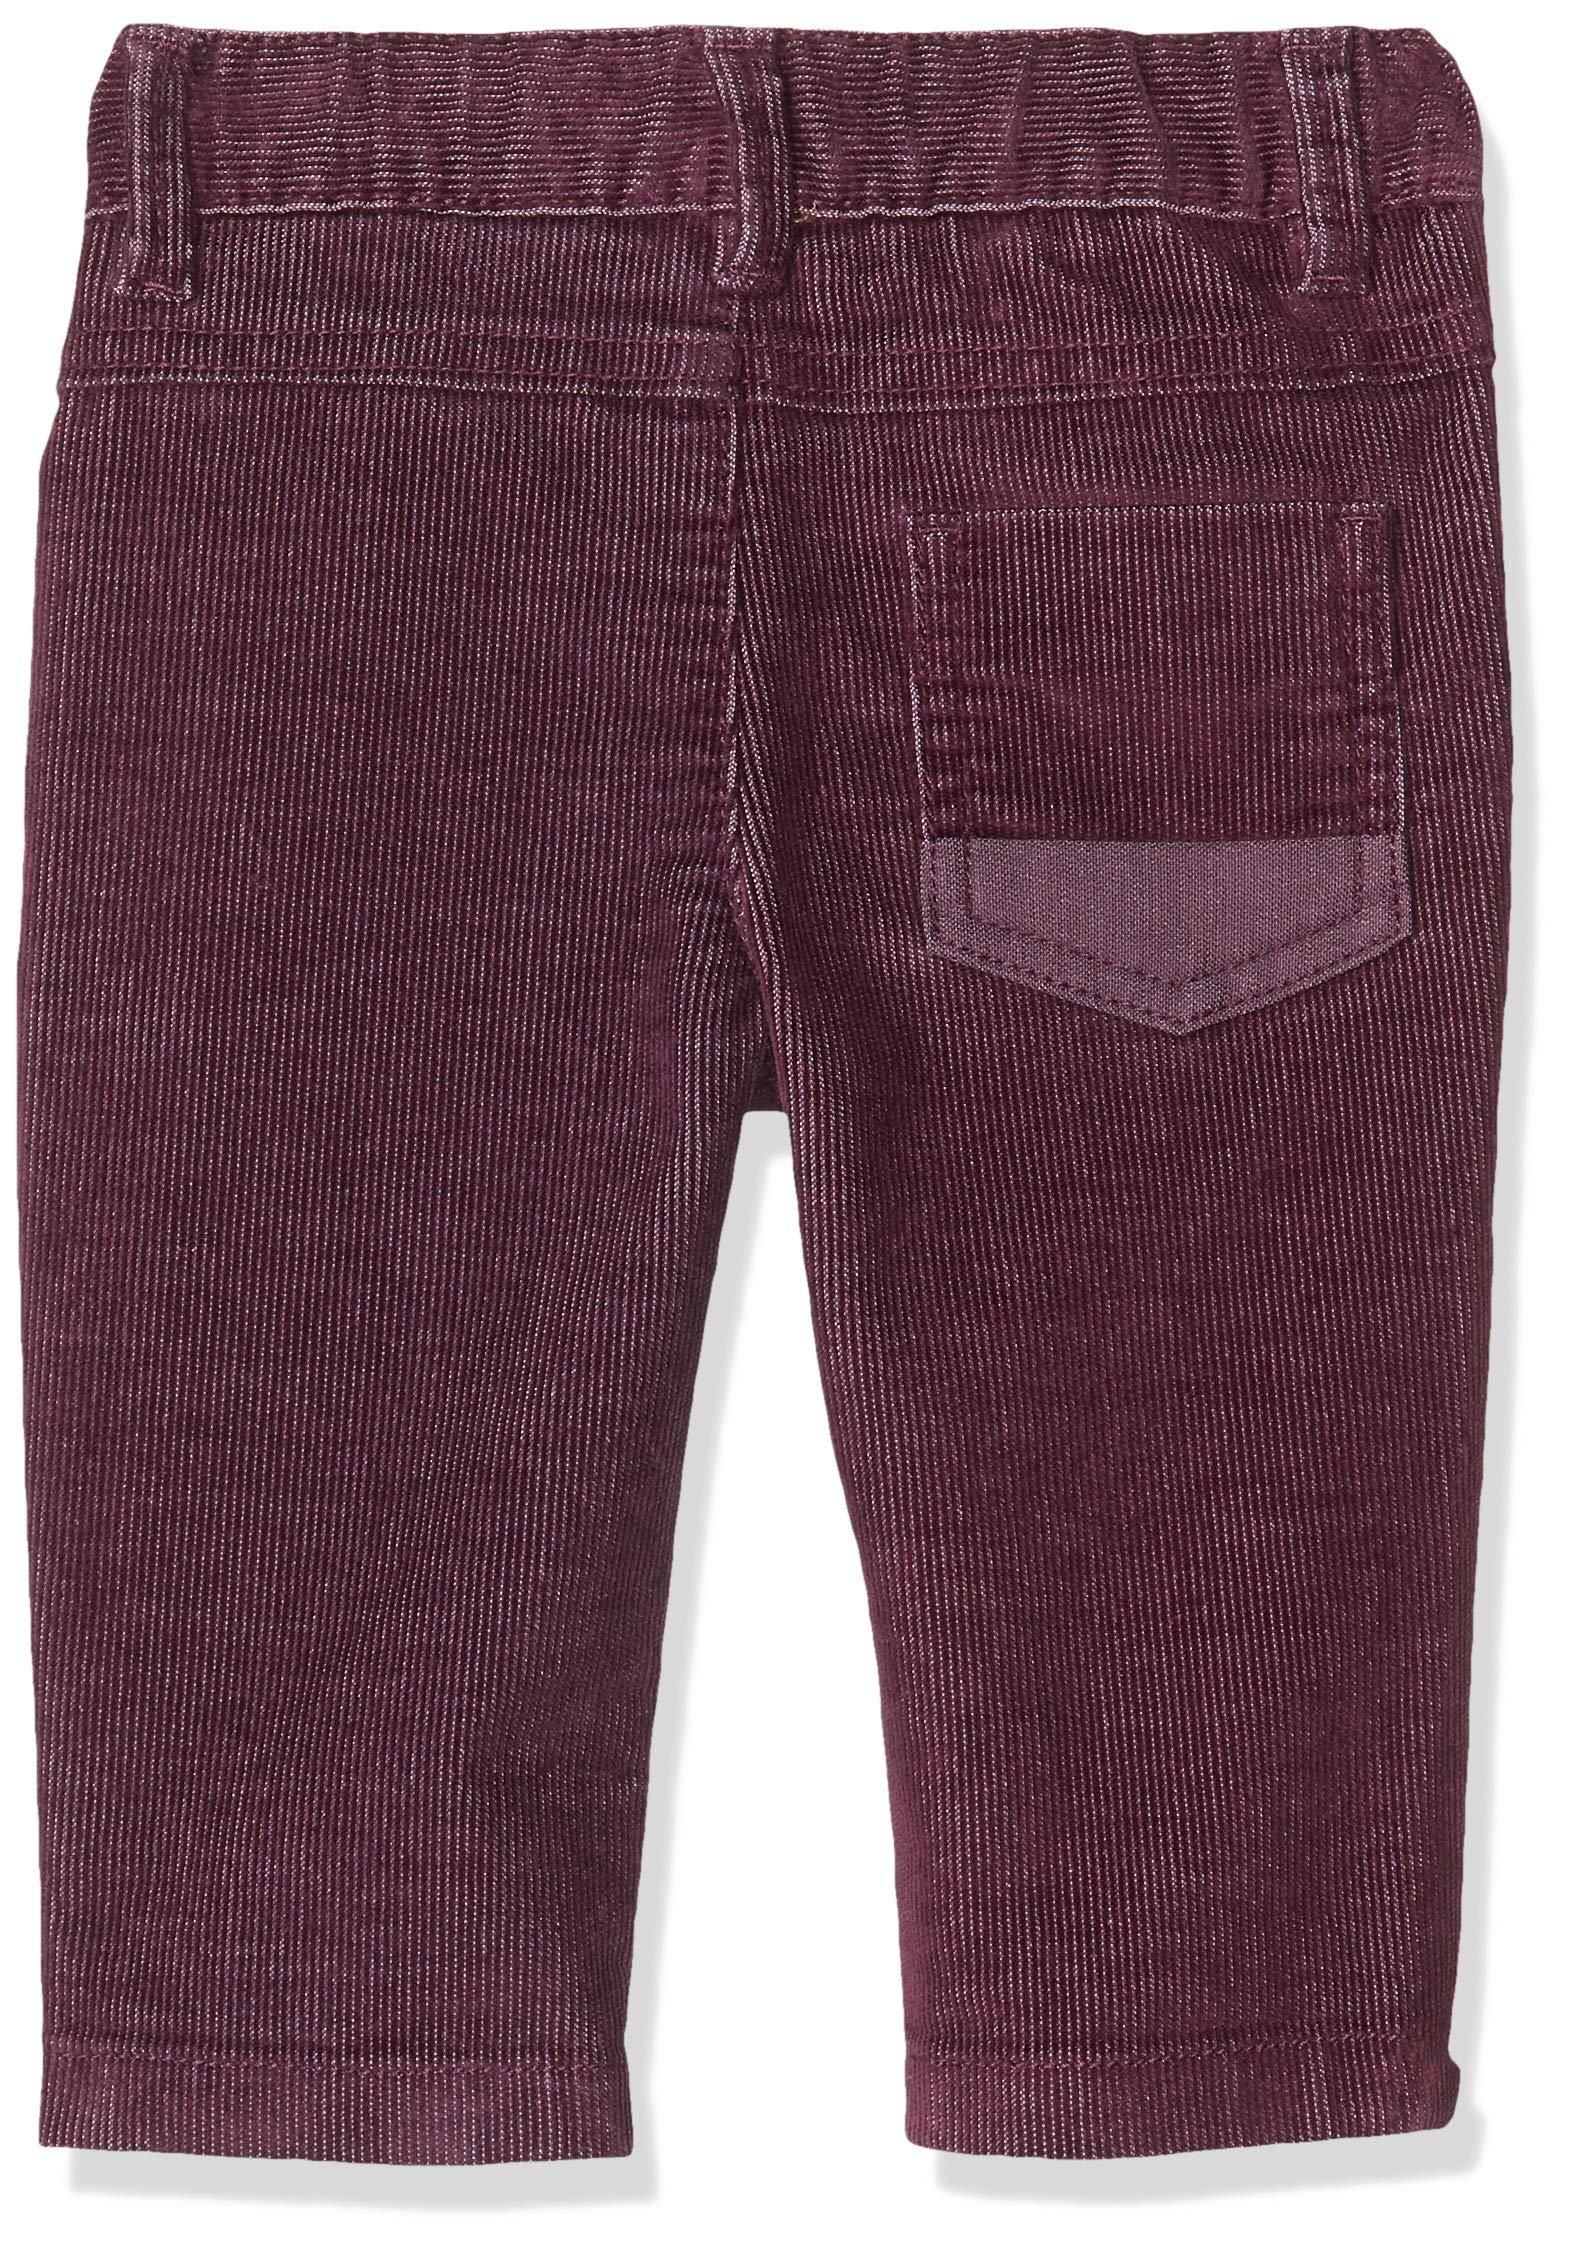 Chicco Pantaloni Lunghi Pantalones para Bebés 2